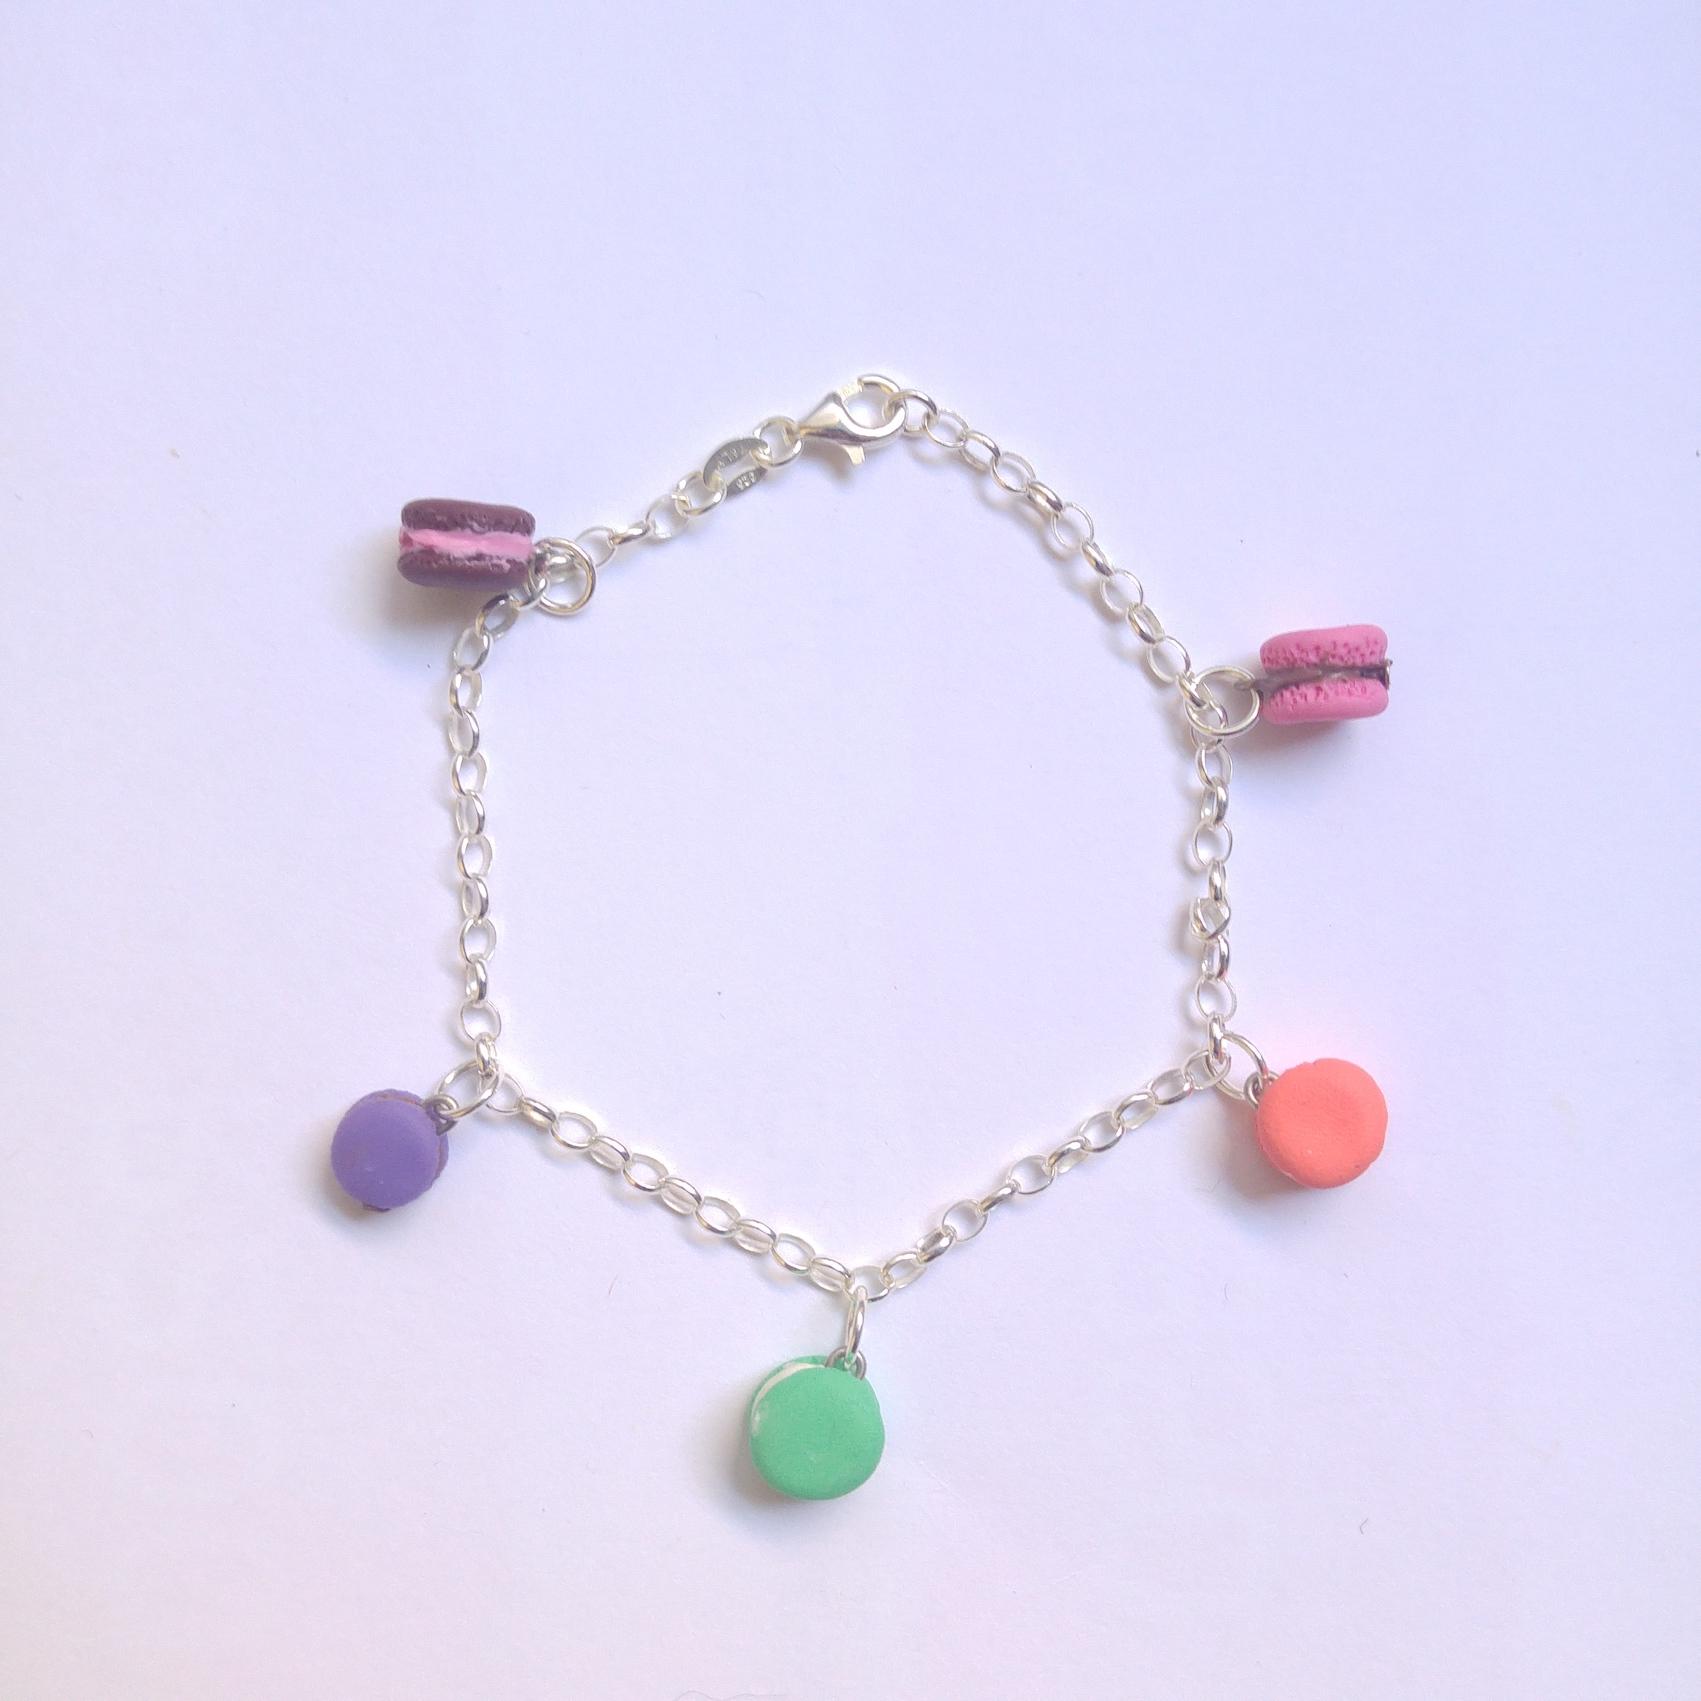 Macaron Bracelet